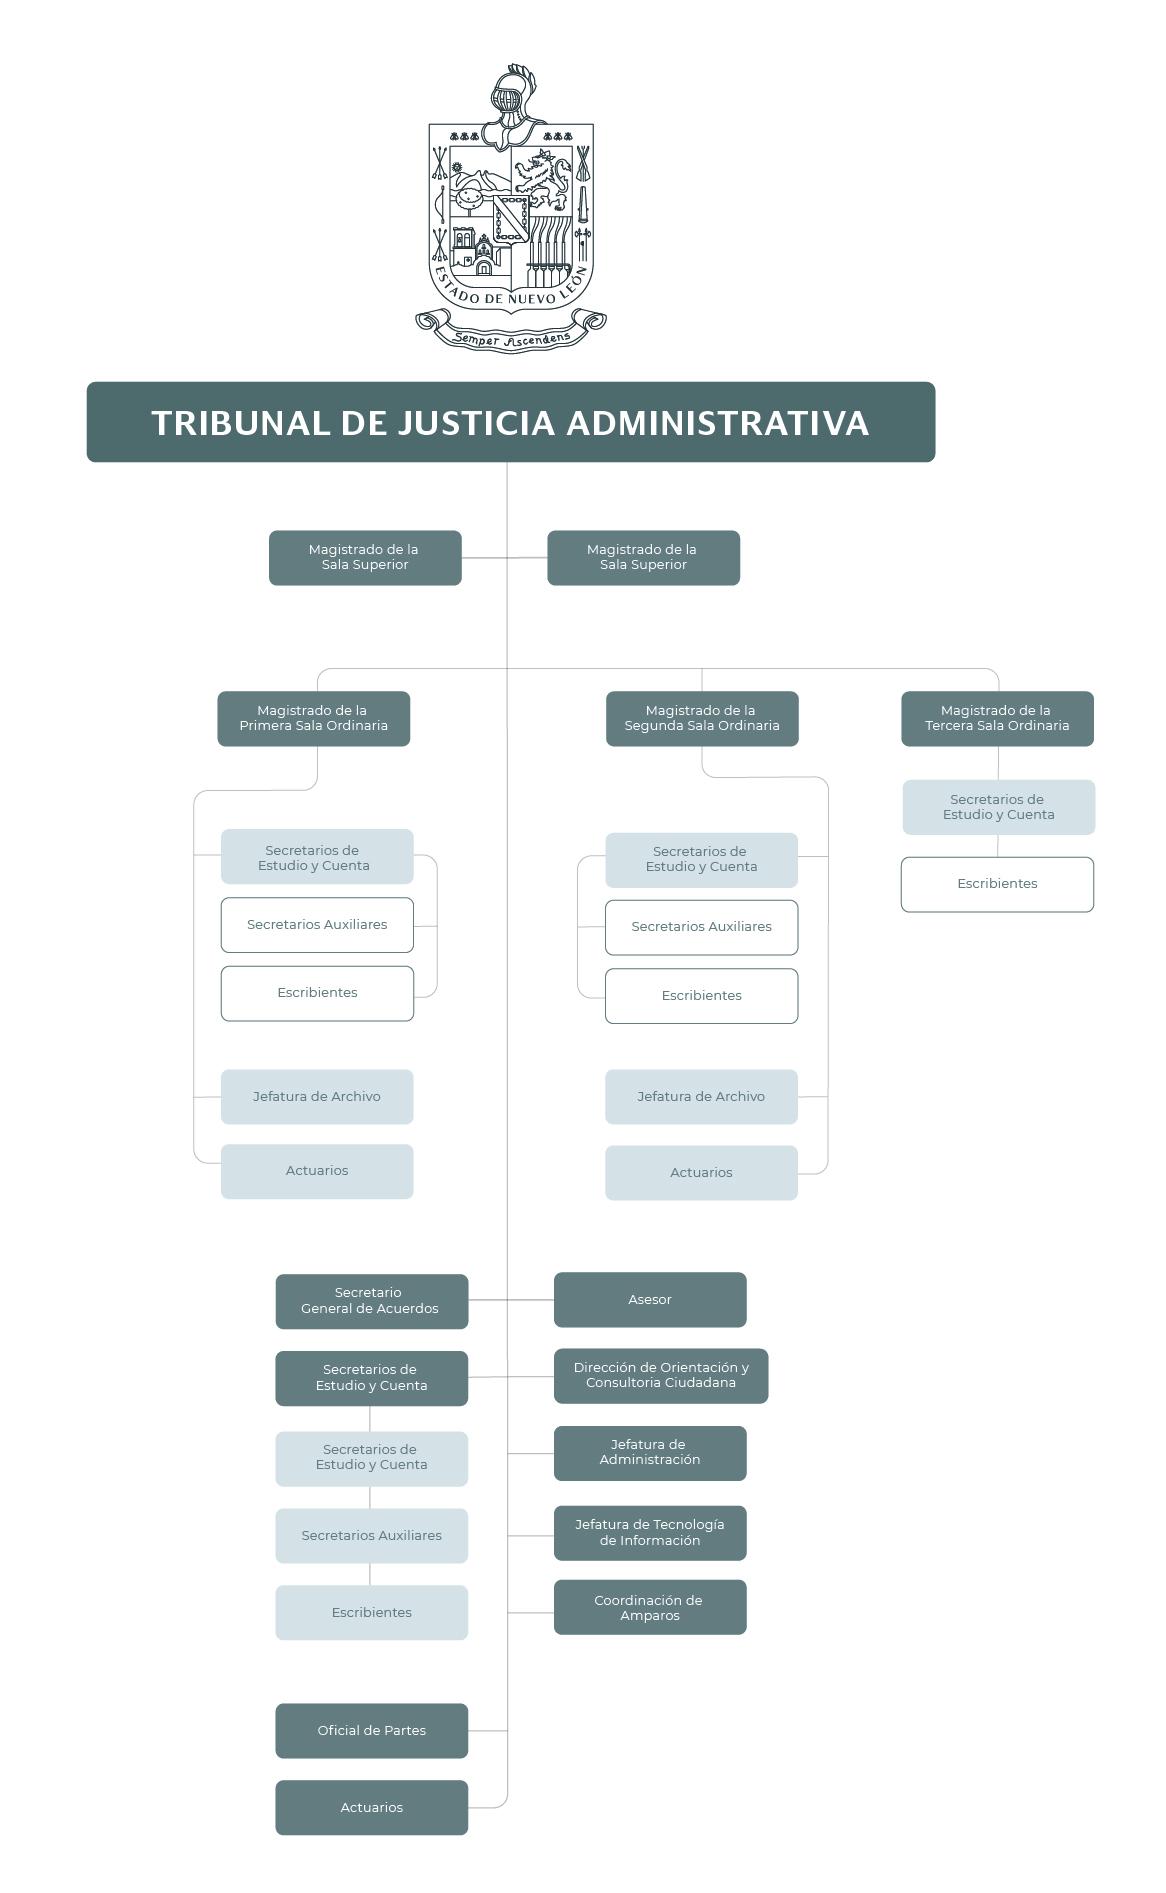 Organigrama del Tribunal de Justicia Administrativa